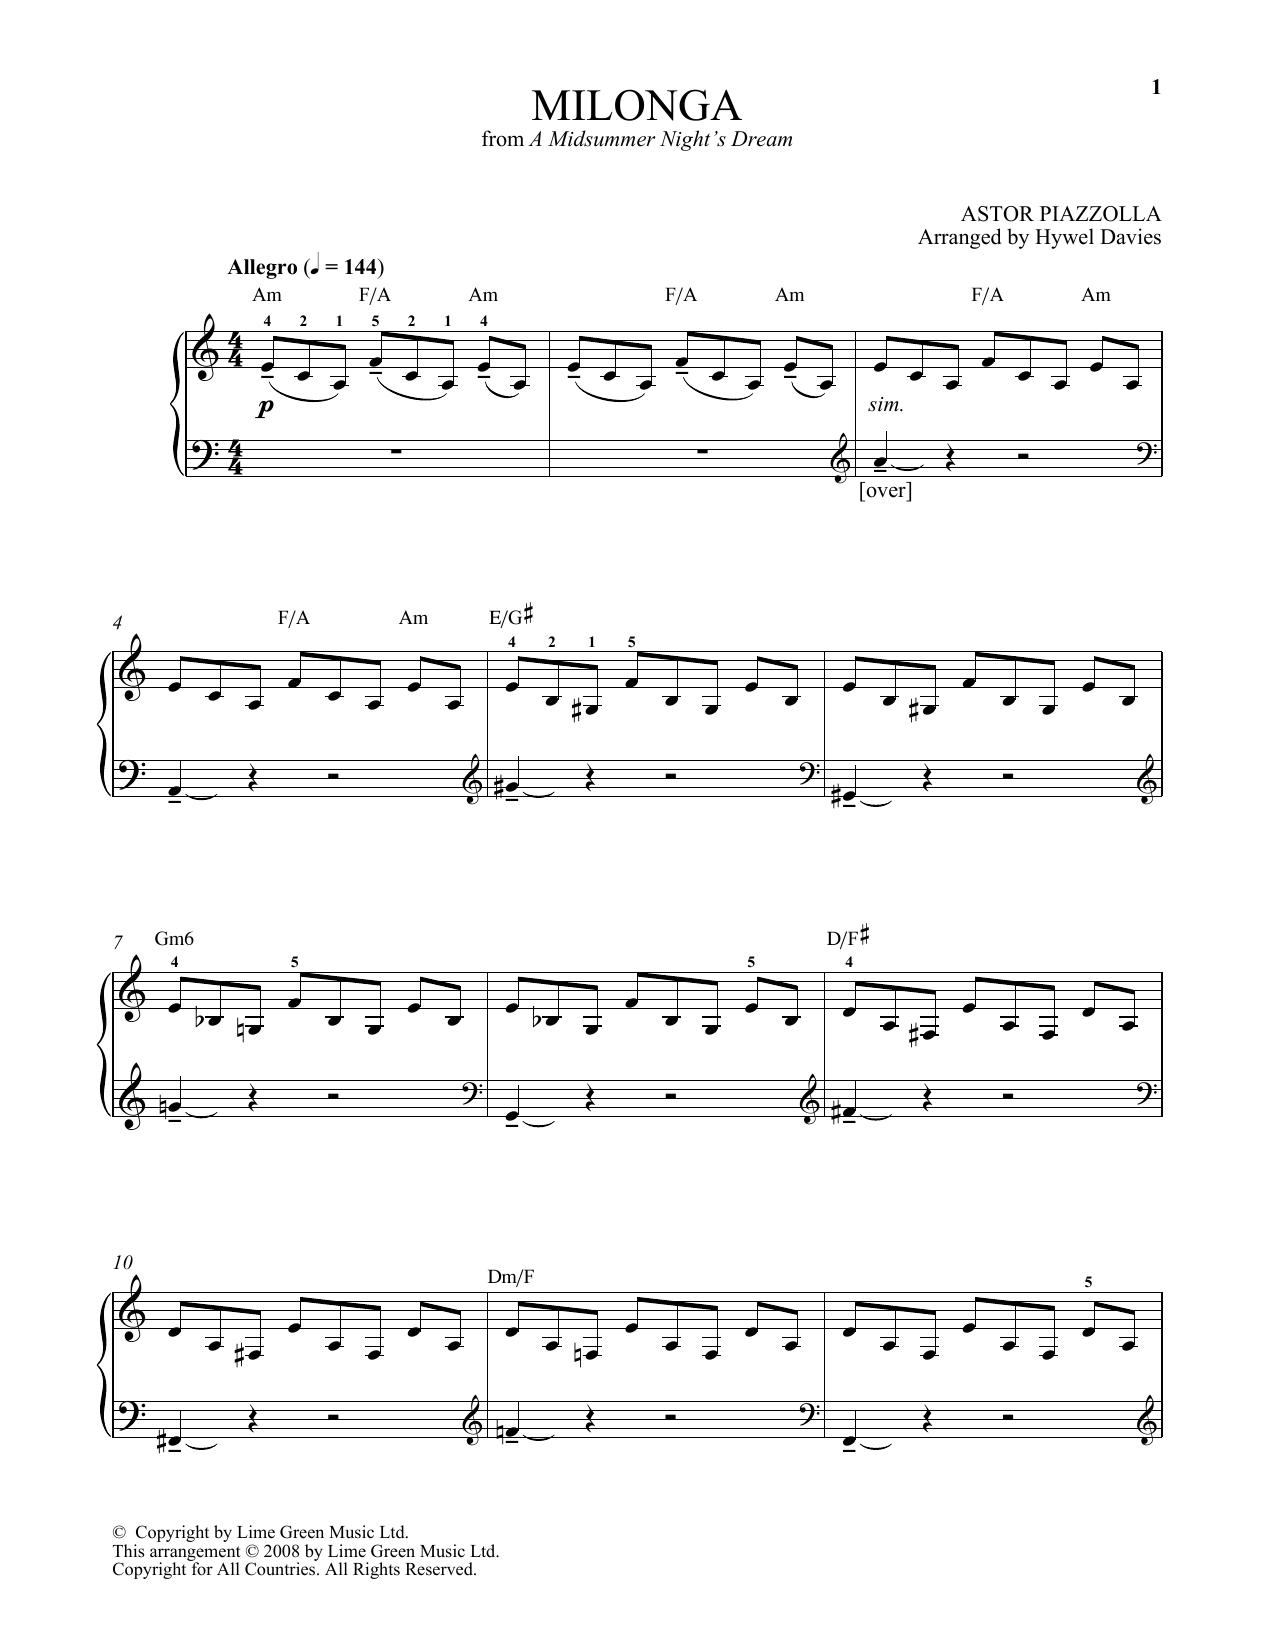 Chanson De La Naissance By Astor Piazzolla